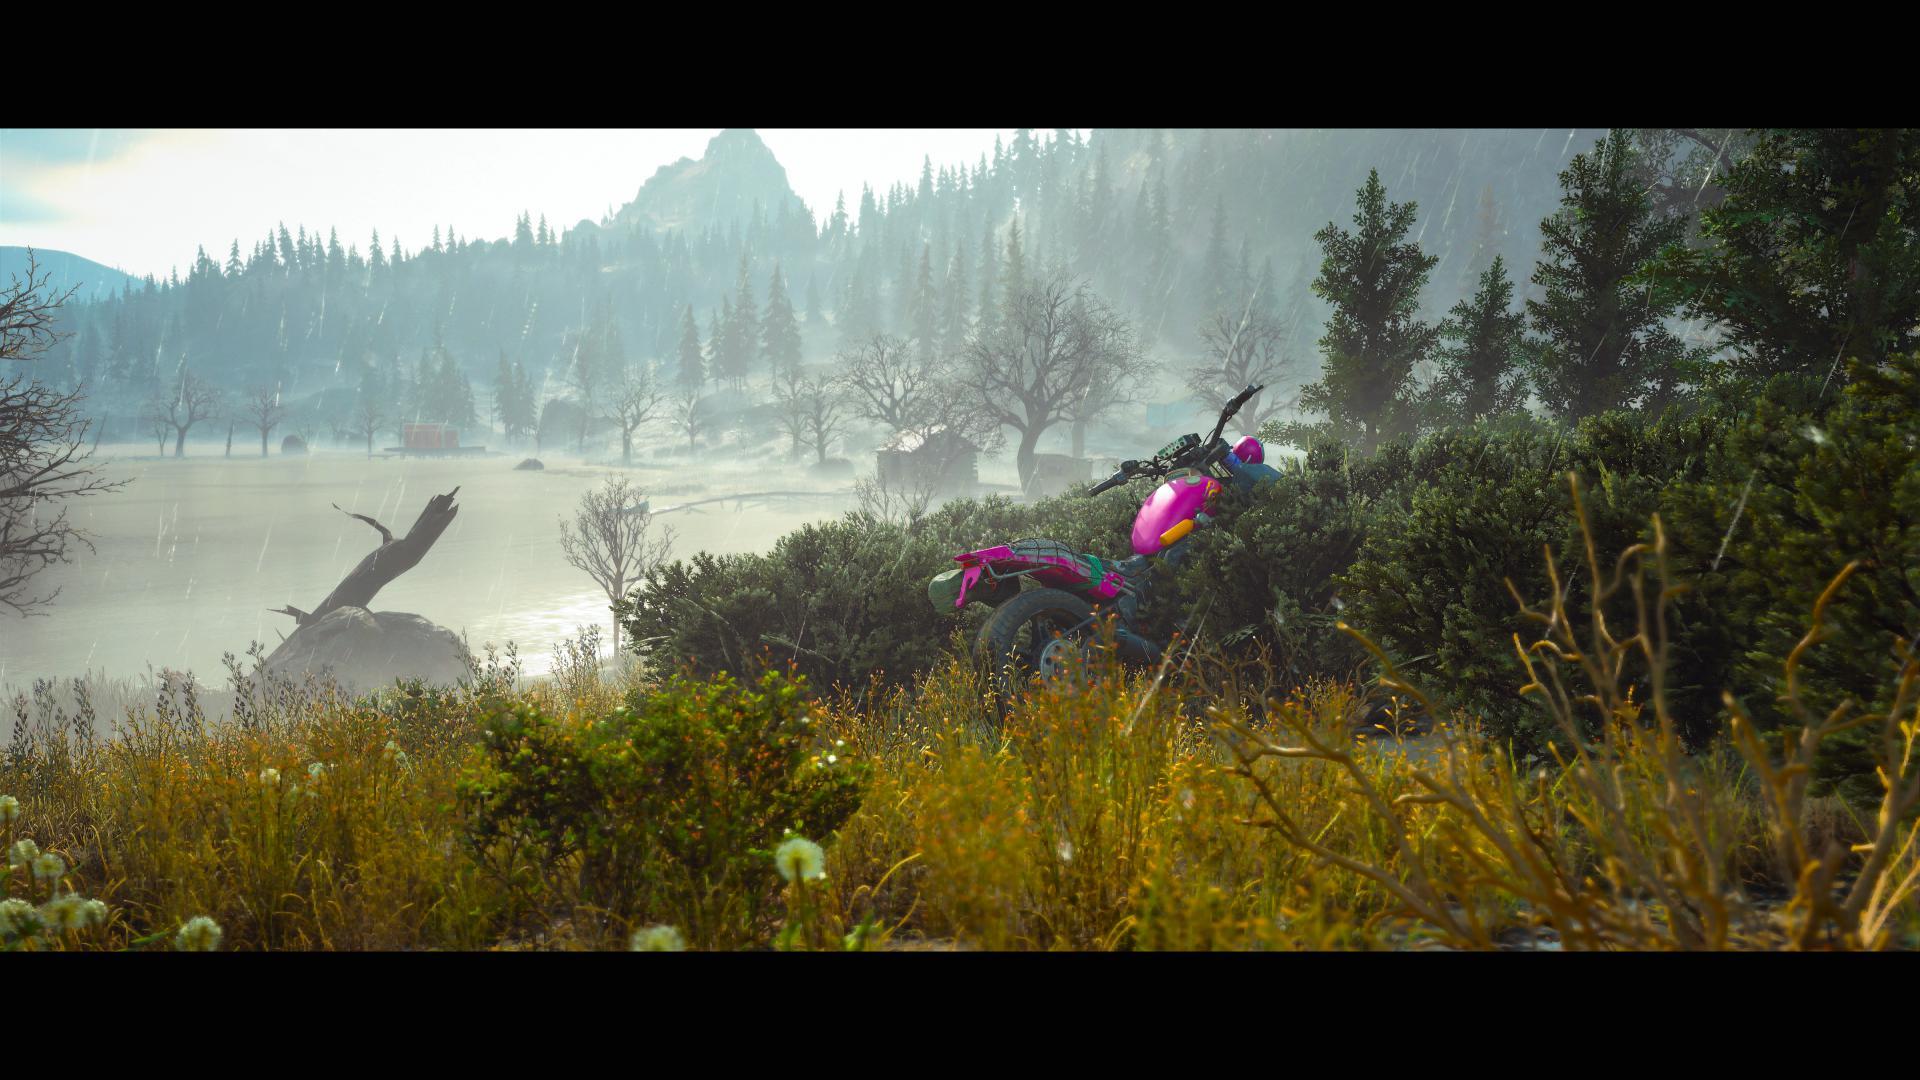 A purple motorbike abandoned in the bushes near a mist laden lake.